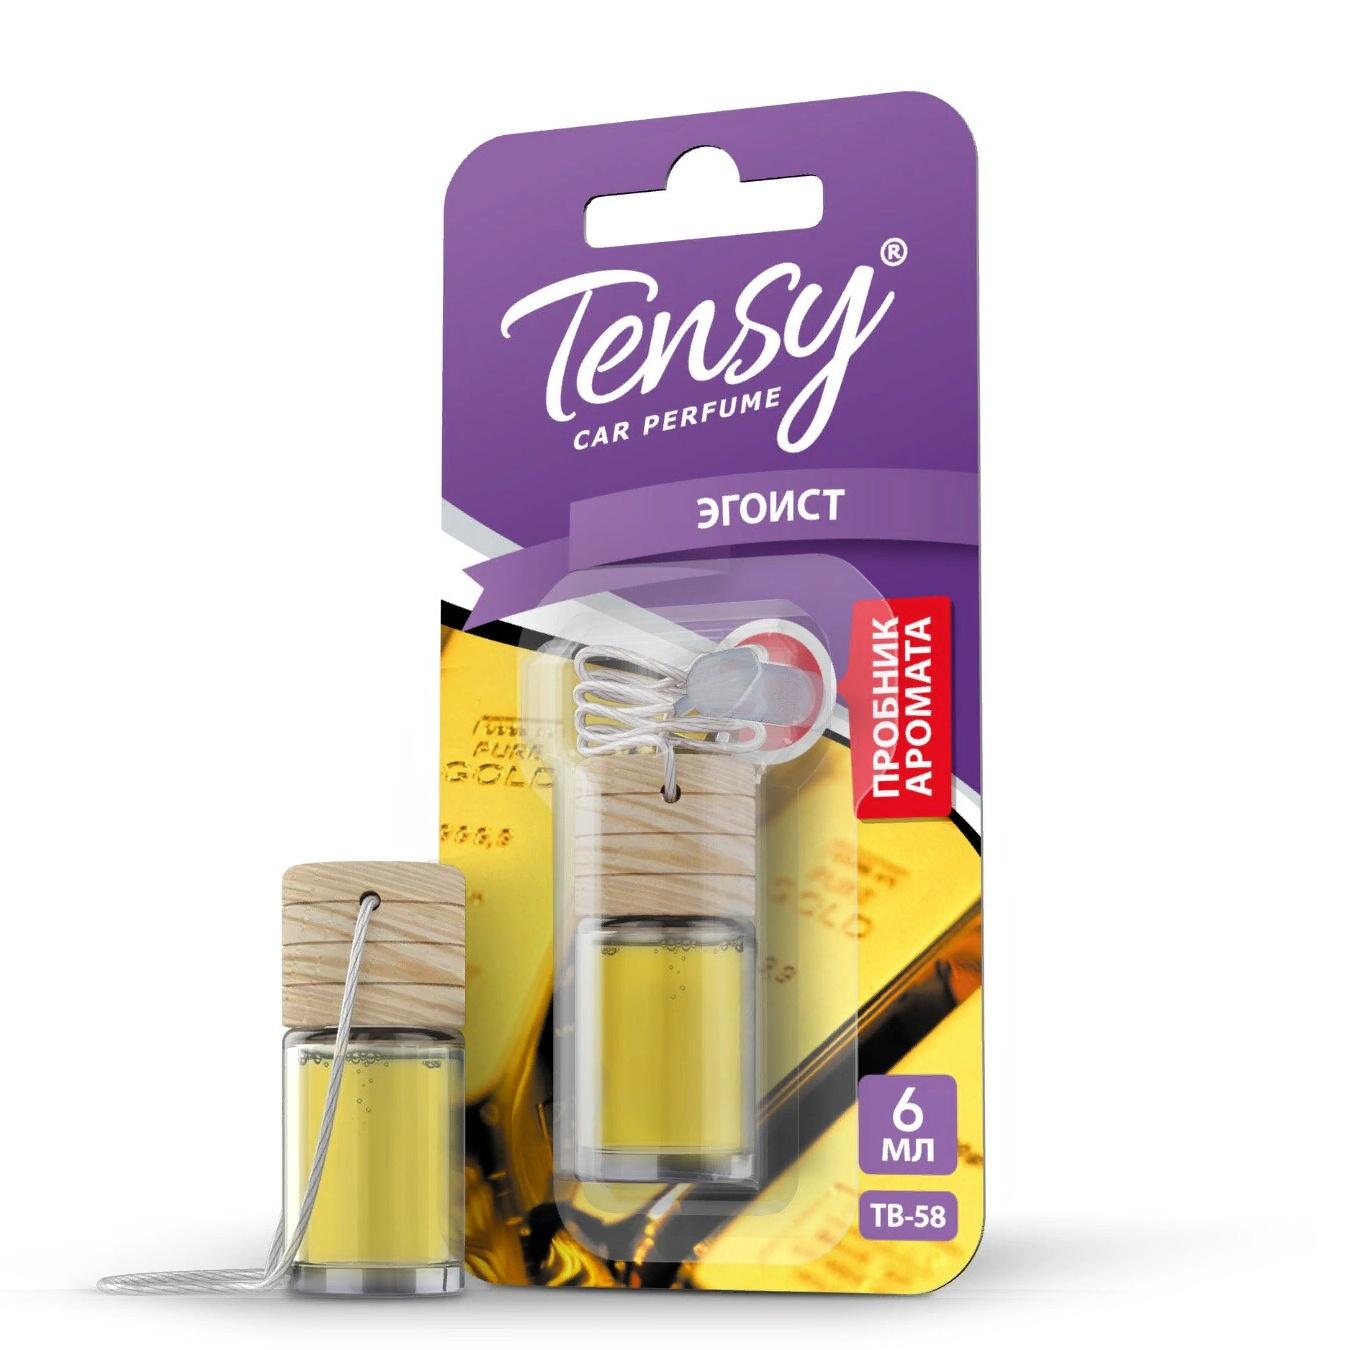 Автомобильный ароматизатор Tensy бутылочка с пробкой, Эгоист ароматизатор эгоист